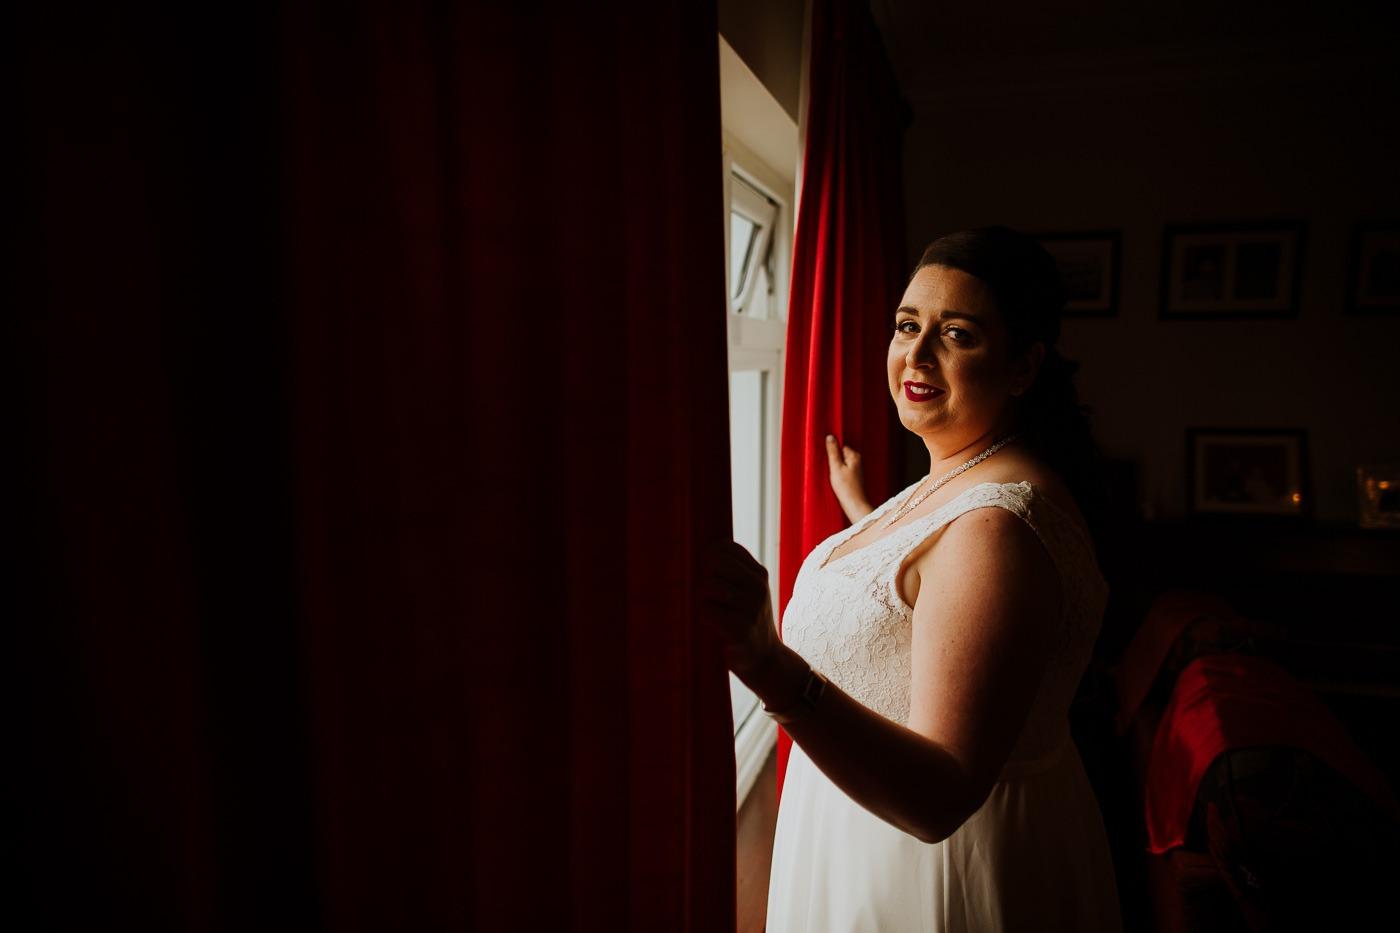 A woman standing in front of a door